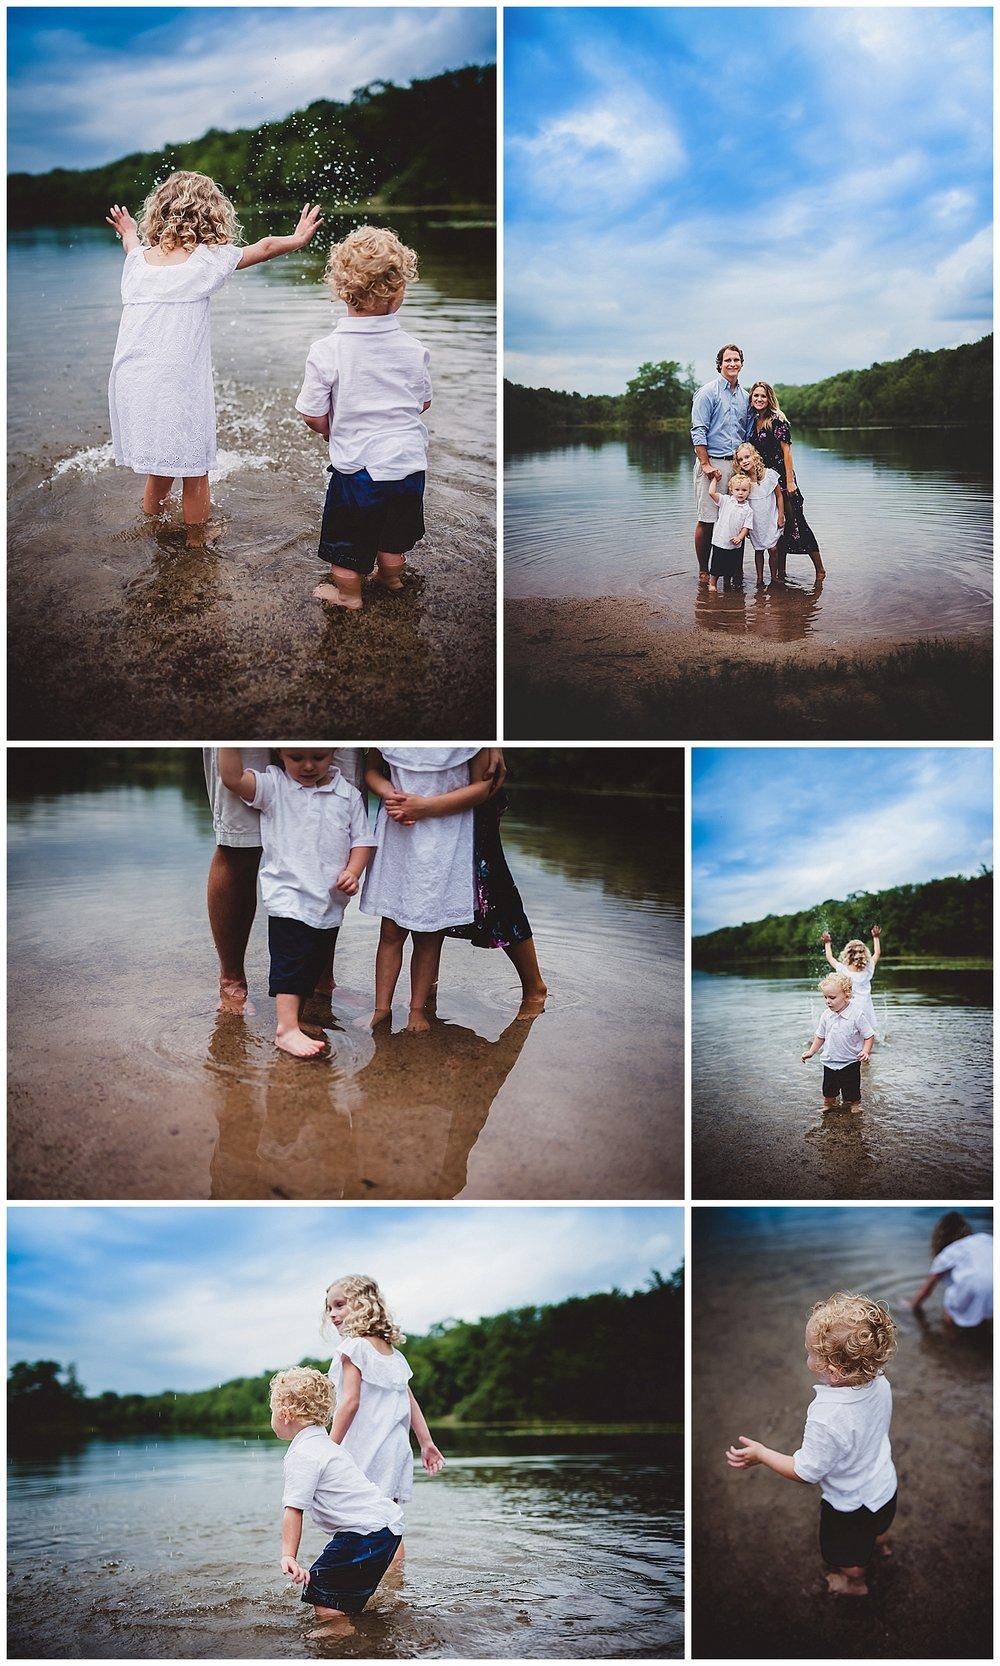 NEPA Family Photographer in Scranton, Pennsylvania